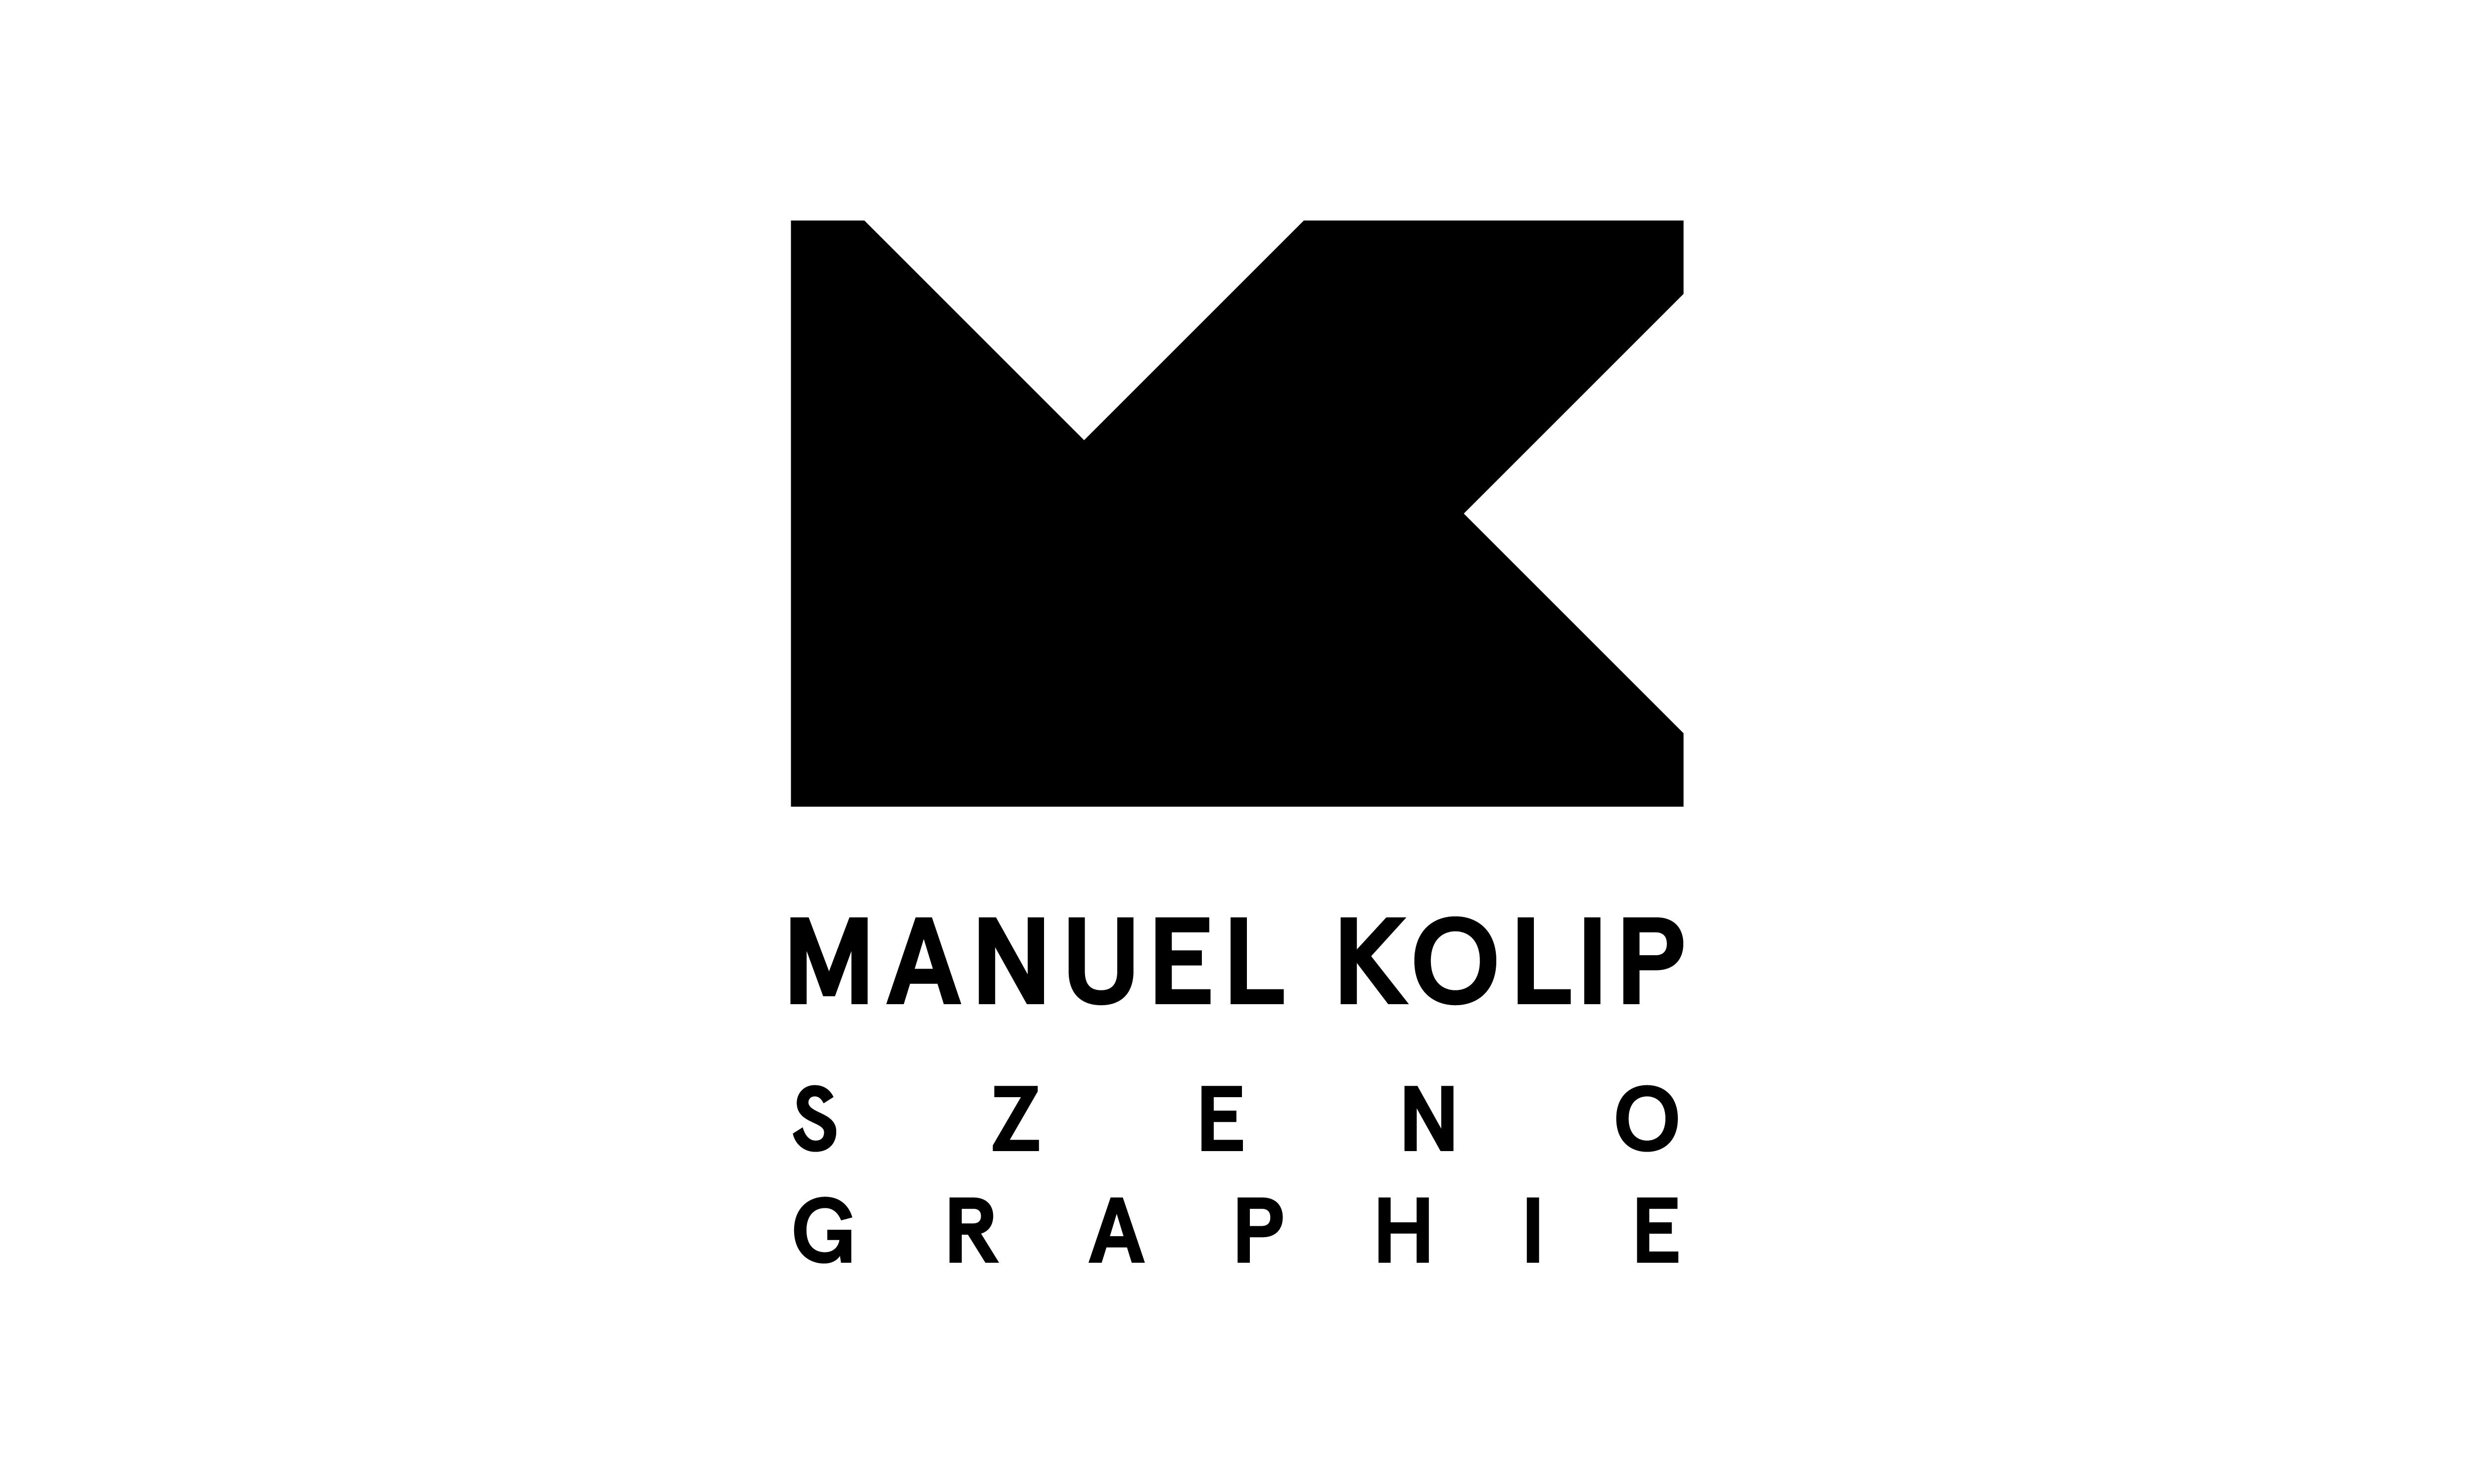 Manuel Kolip Szenographie